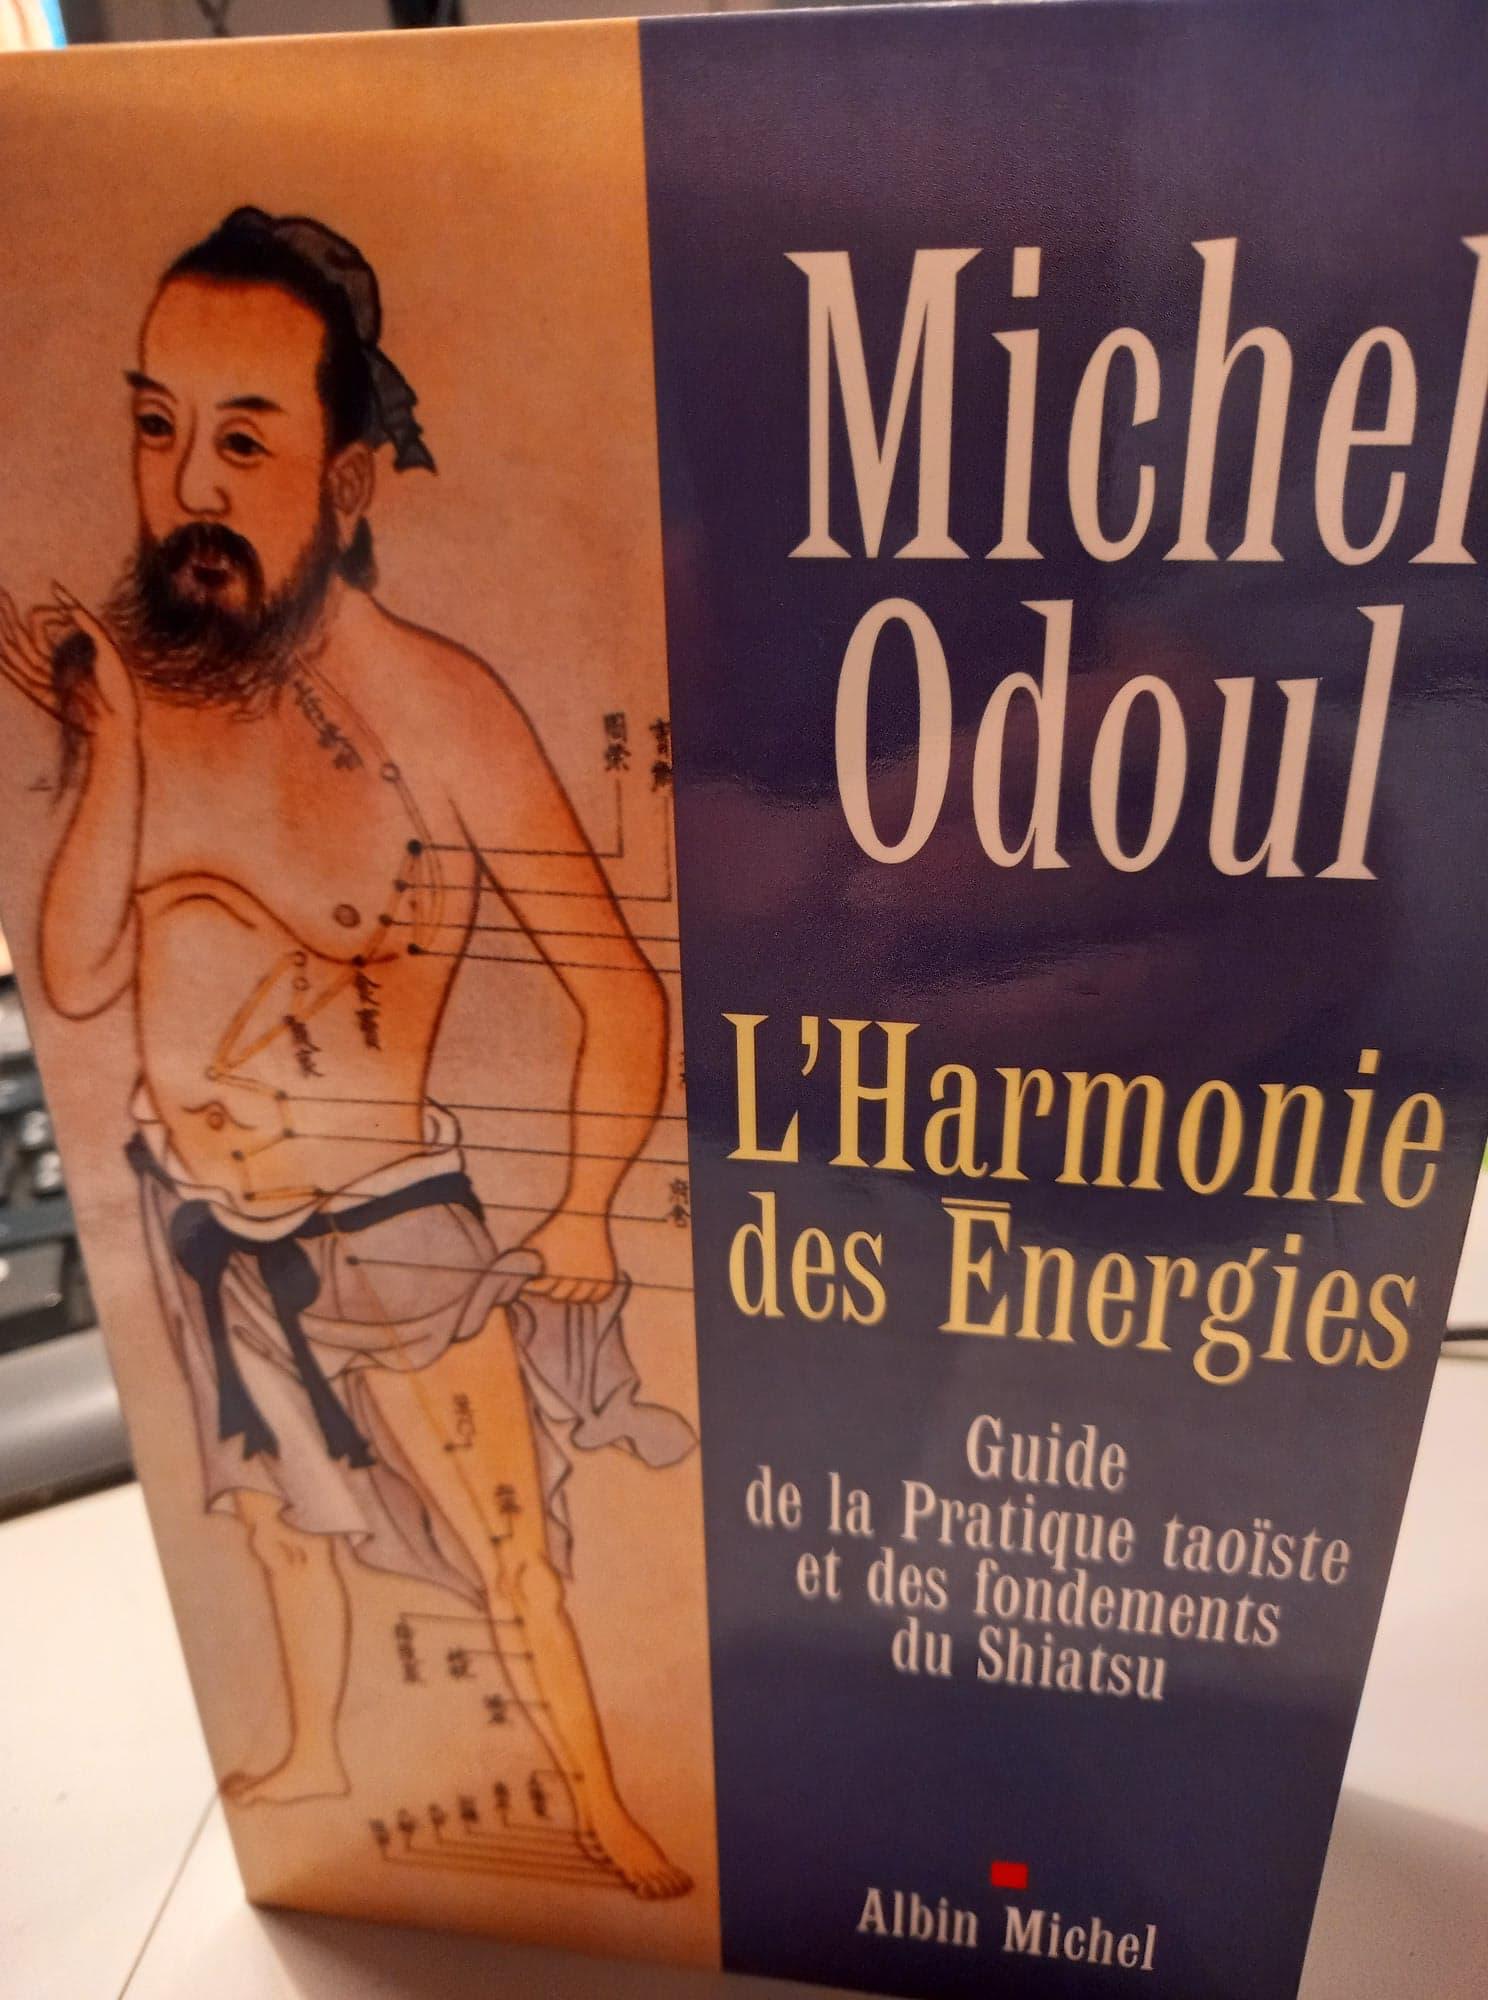 Michel Odoul, l'harmonie des Energies